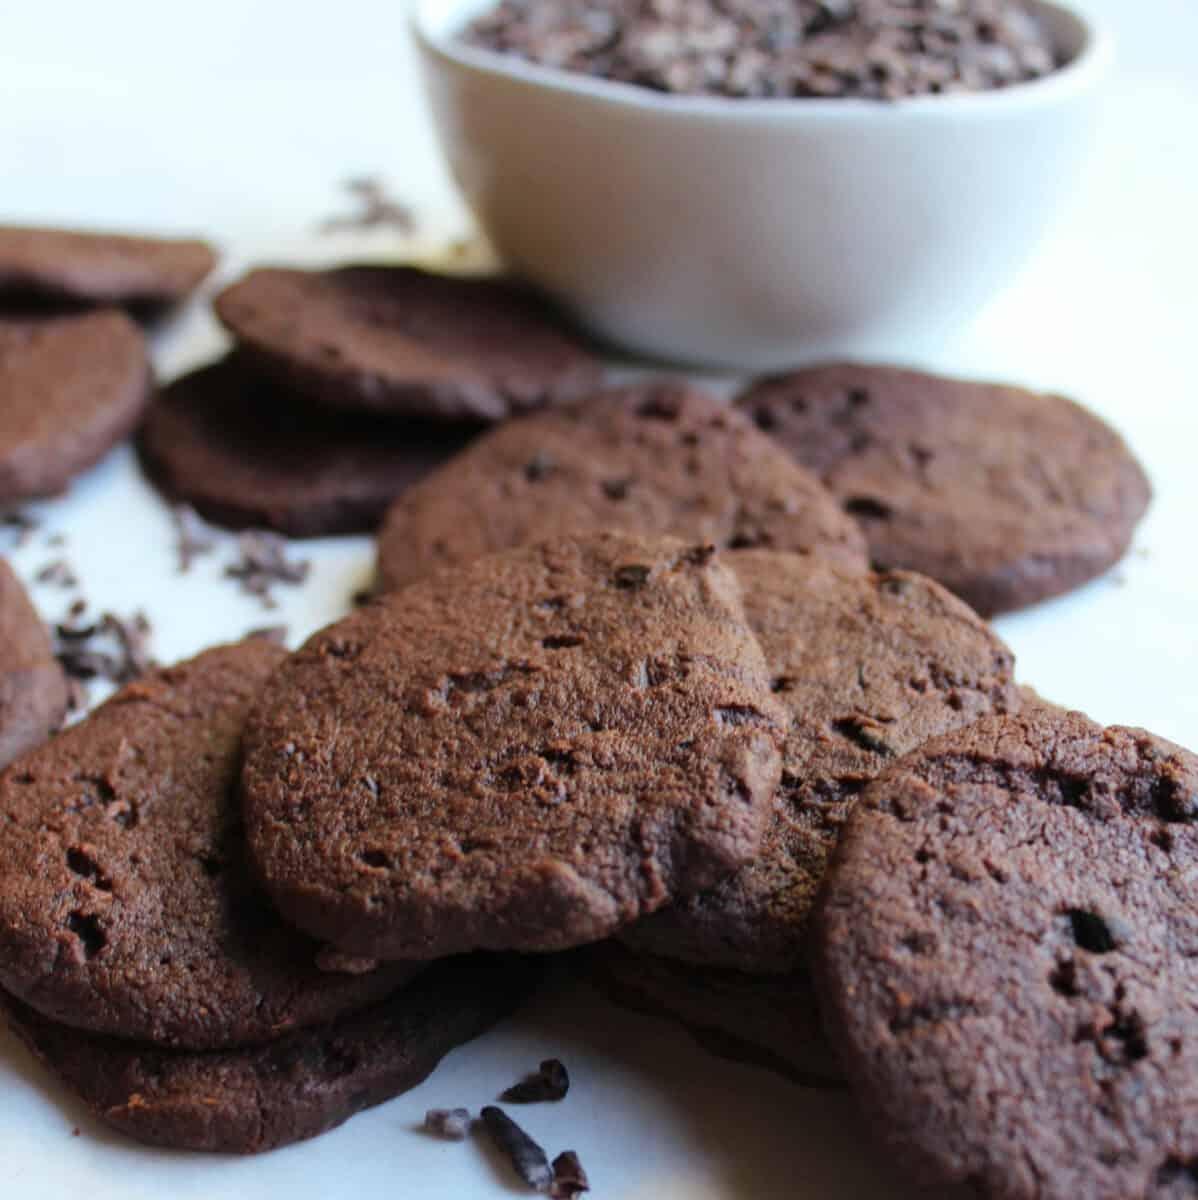 chocolate cacaco nib cookies.